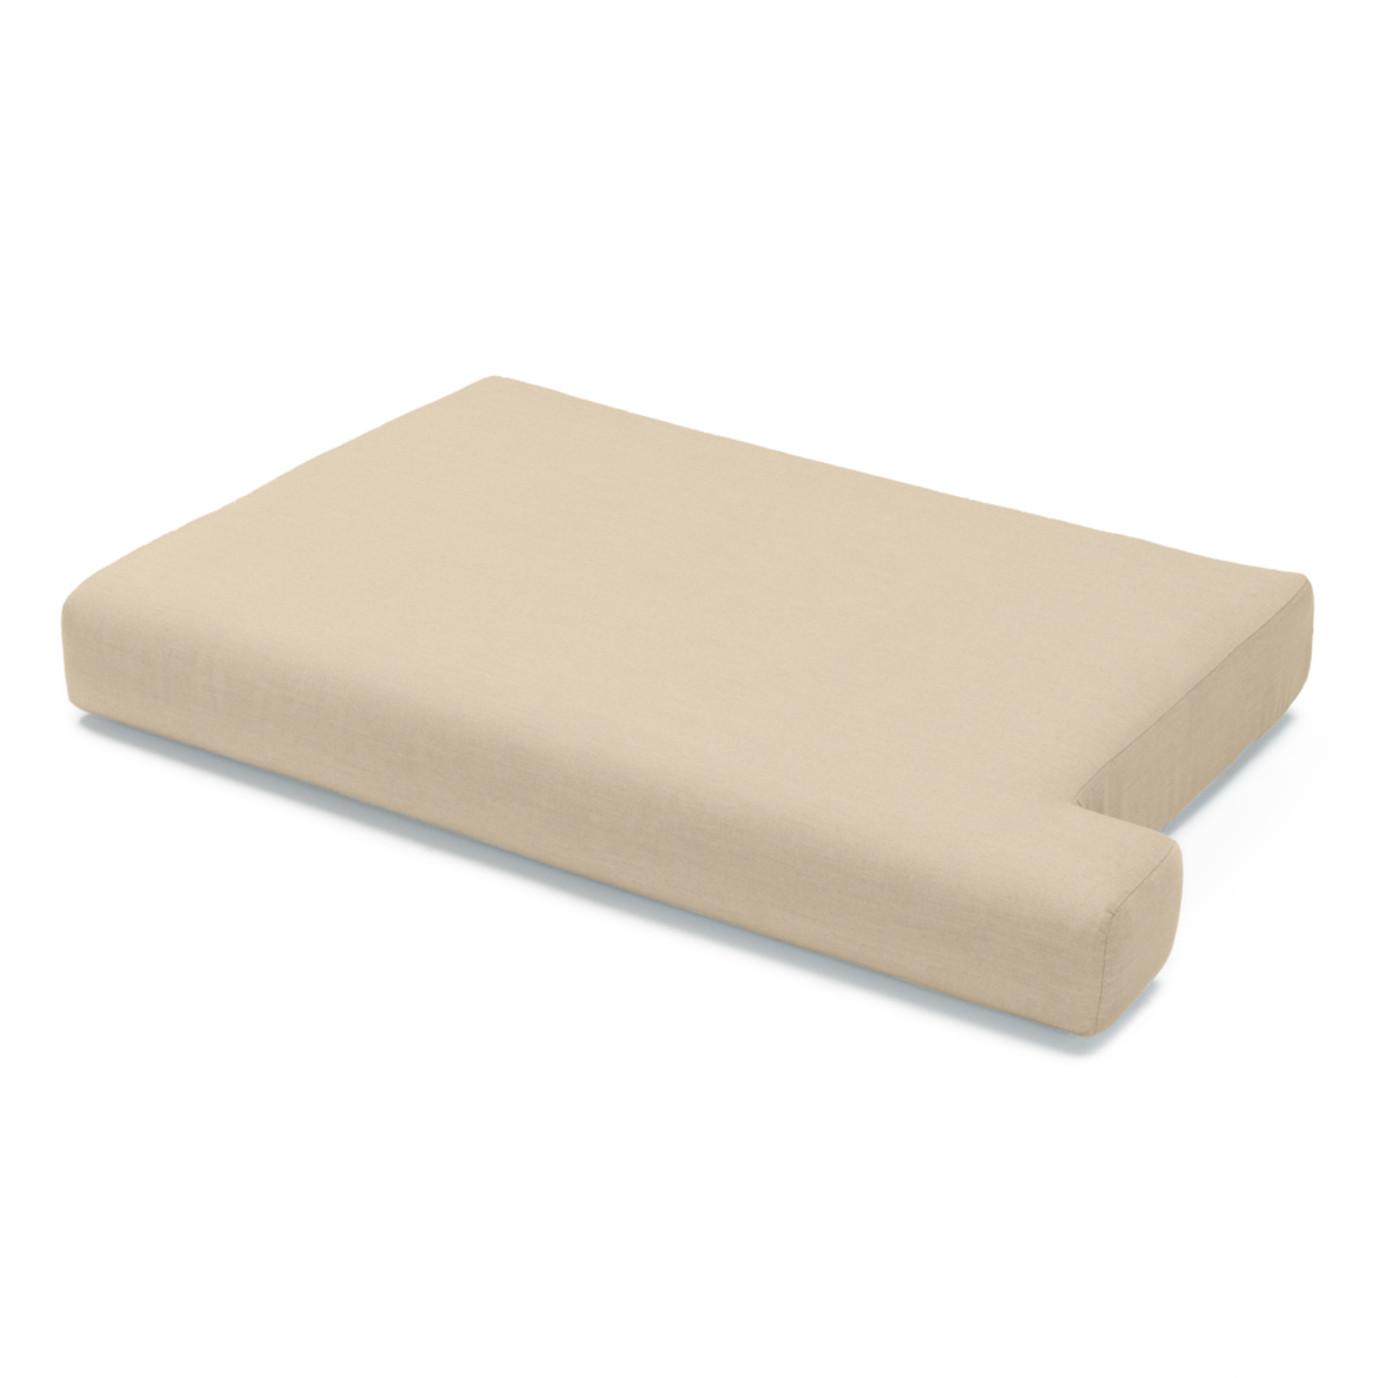 Portofino Comfort 88in Sofa Left Base Cushion - Heather Beige